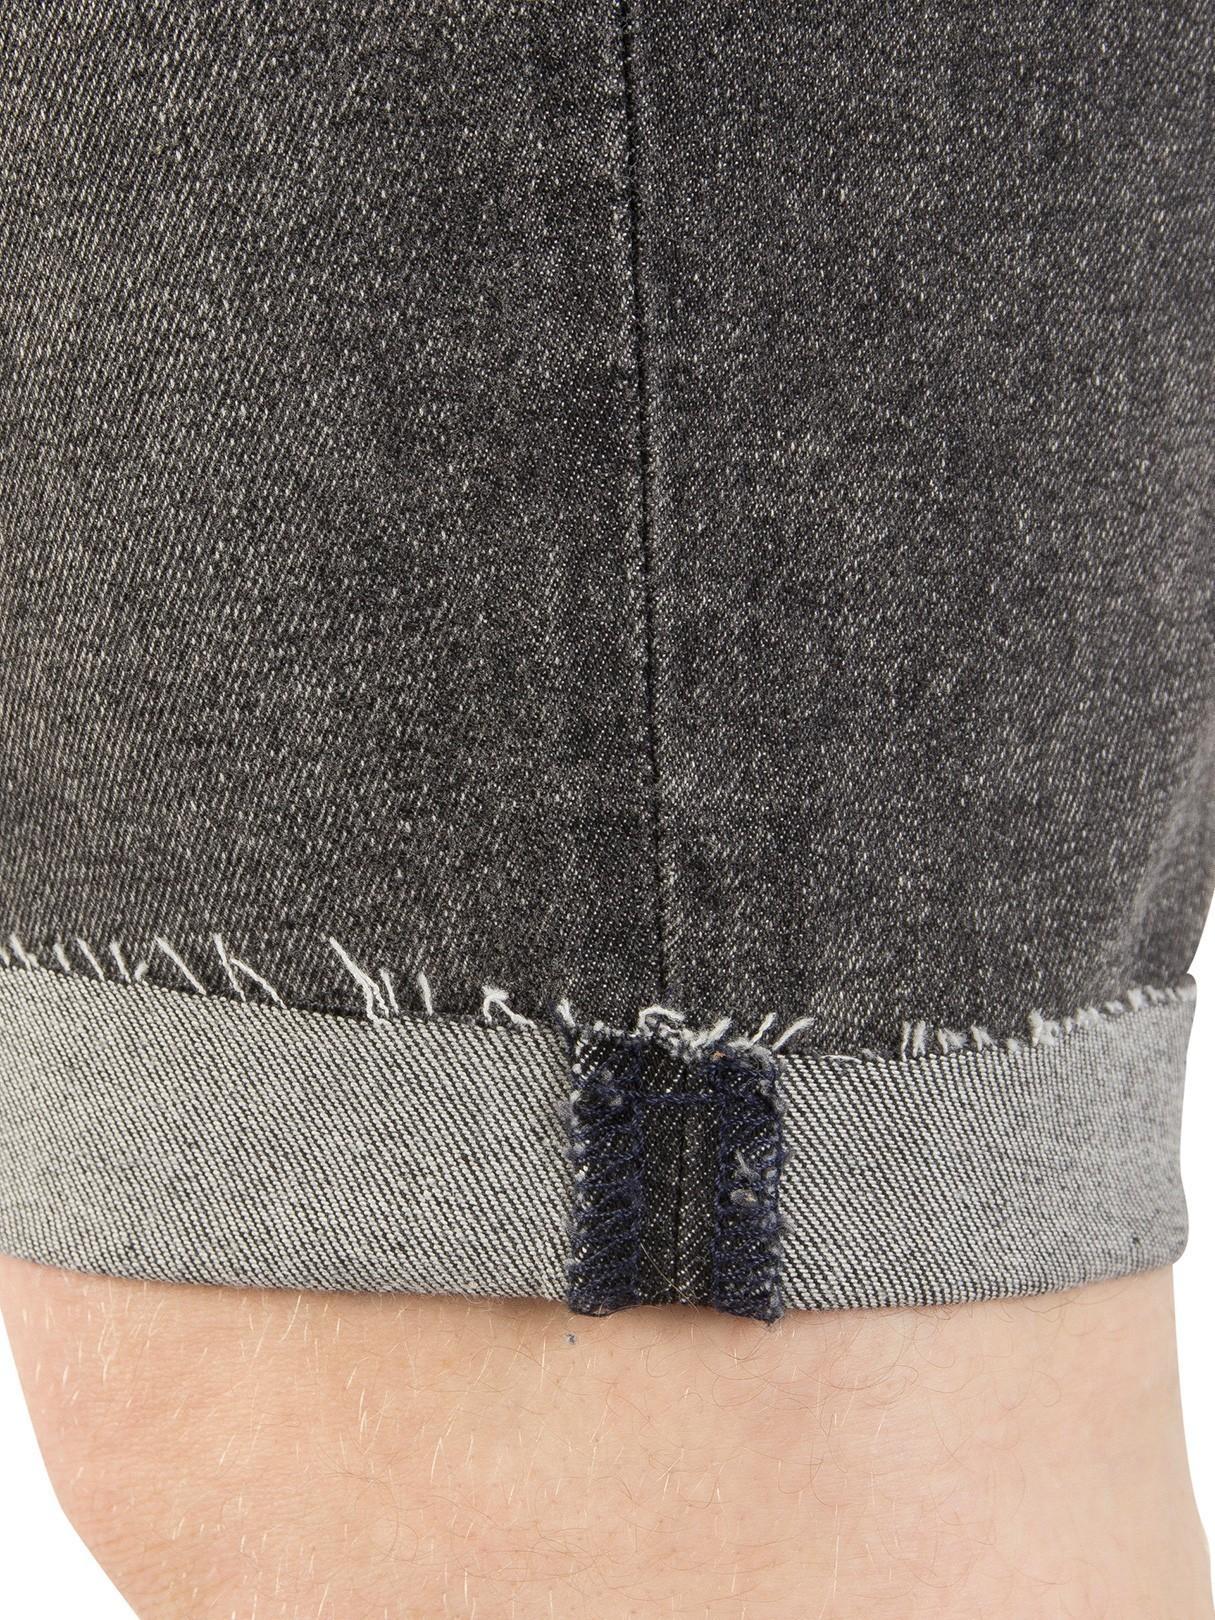 b3ba558d Levi's Charcoal 511 Slim Cutoff Bloke Denim Shorts | Standout